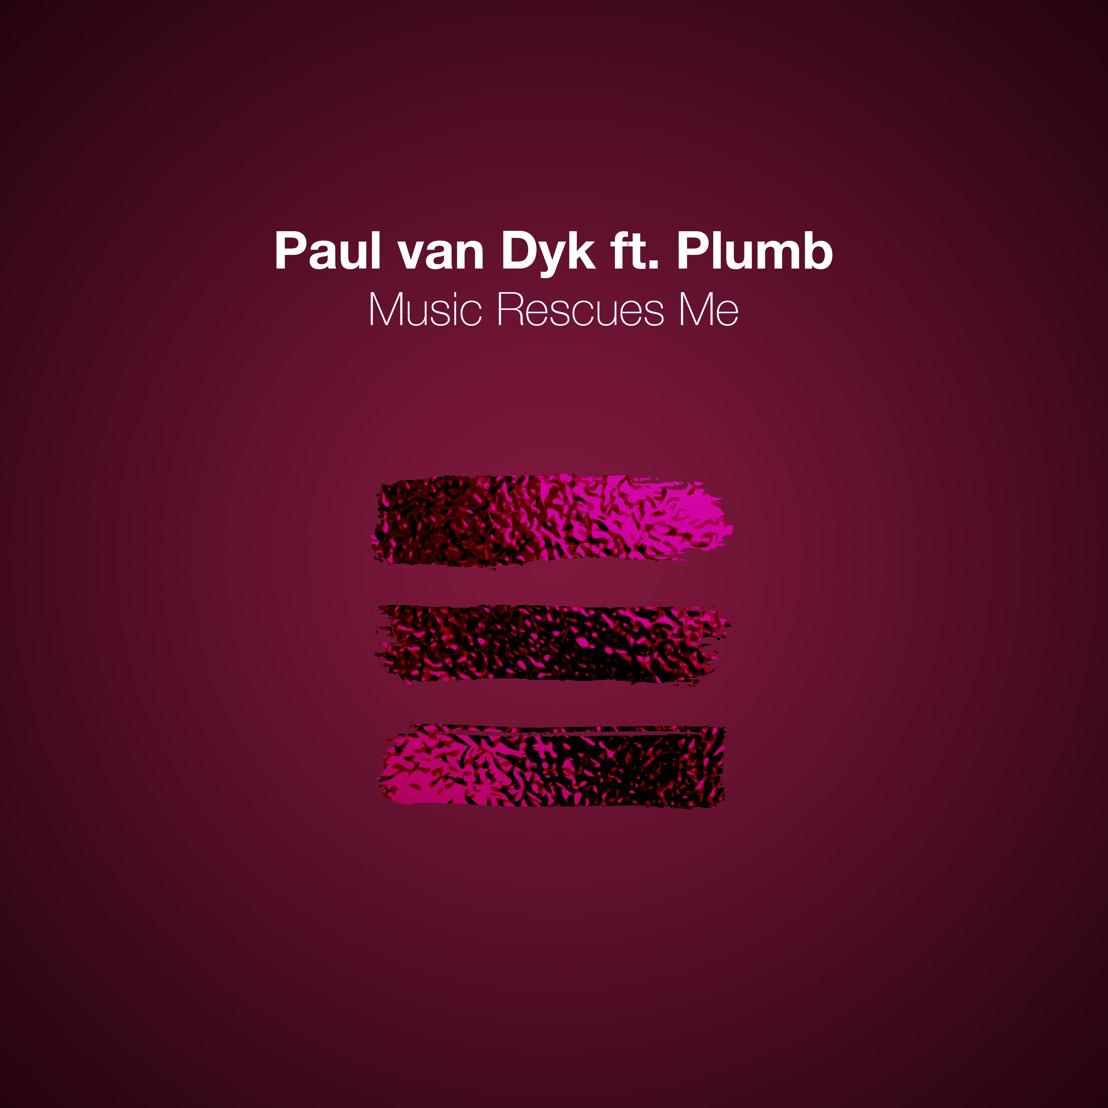 Paul van Dyk Releases New Single: Music Rescues Me feat. Plumb